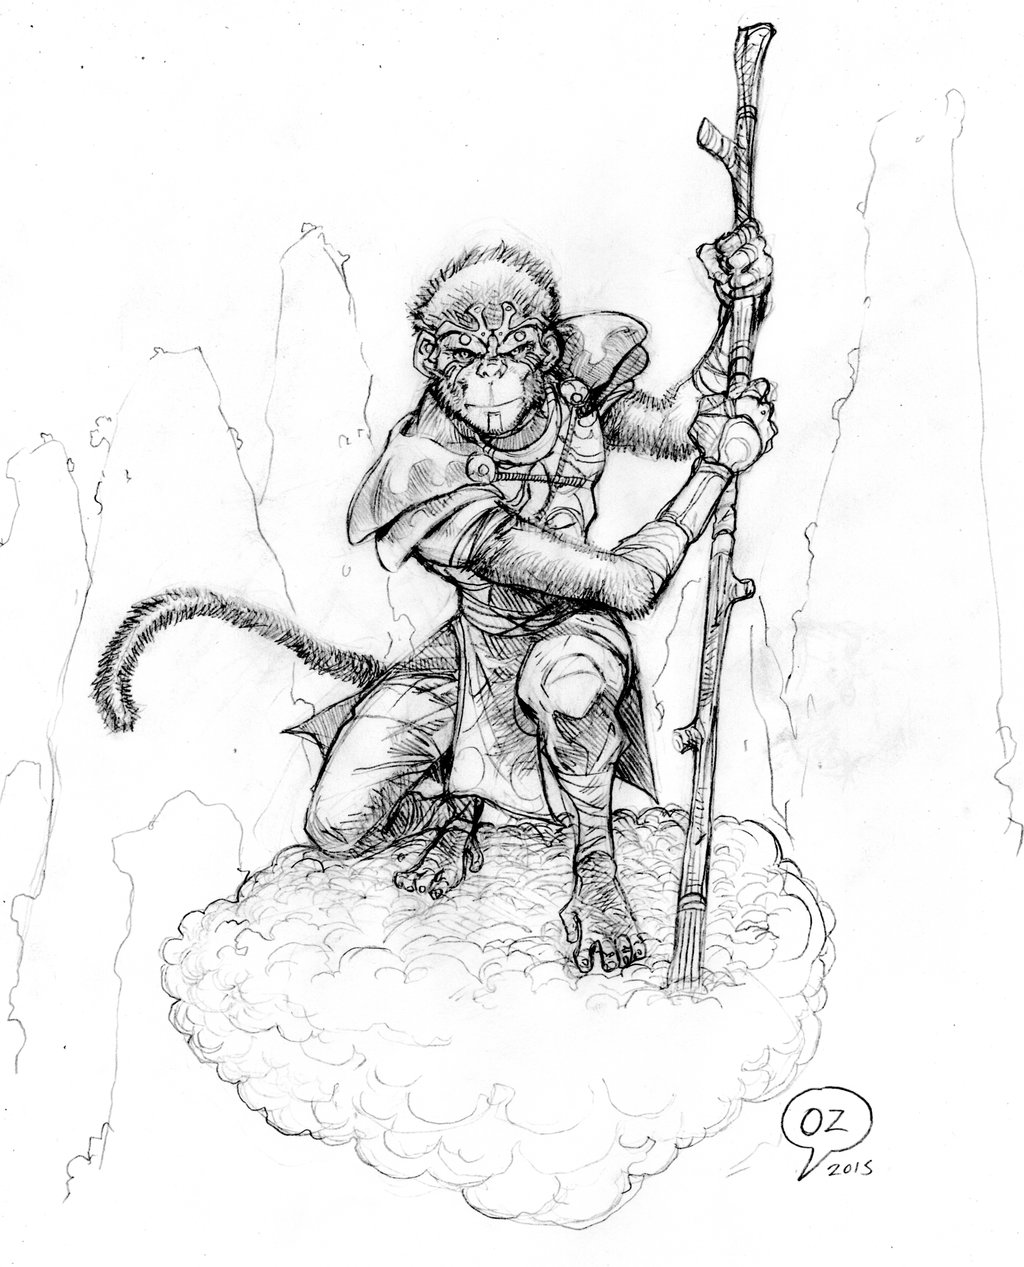 1024x1267 Monkey King (Sun Wukong) Sketch By Ozartwork